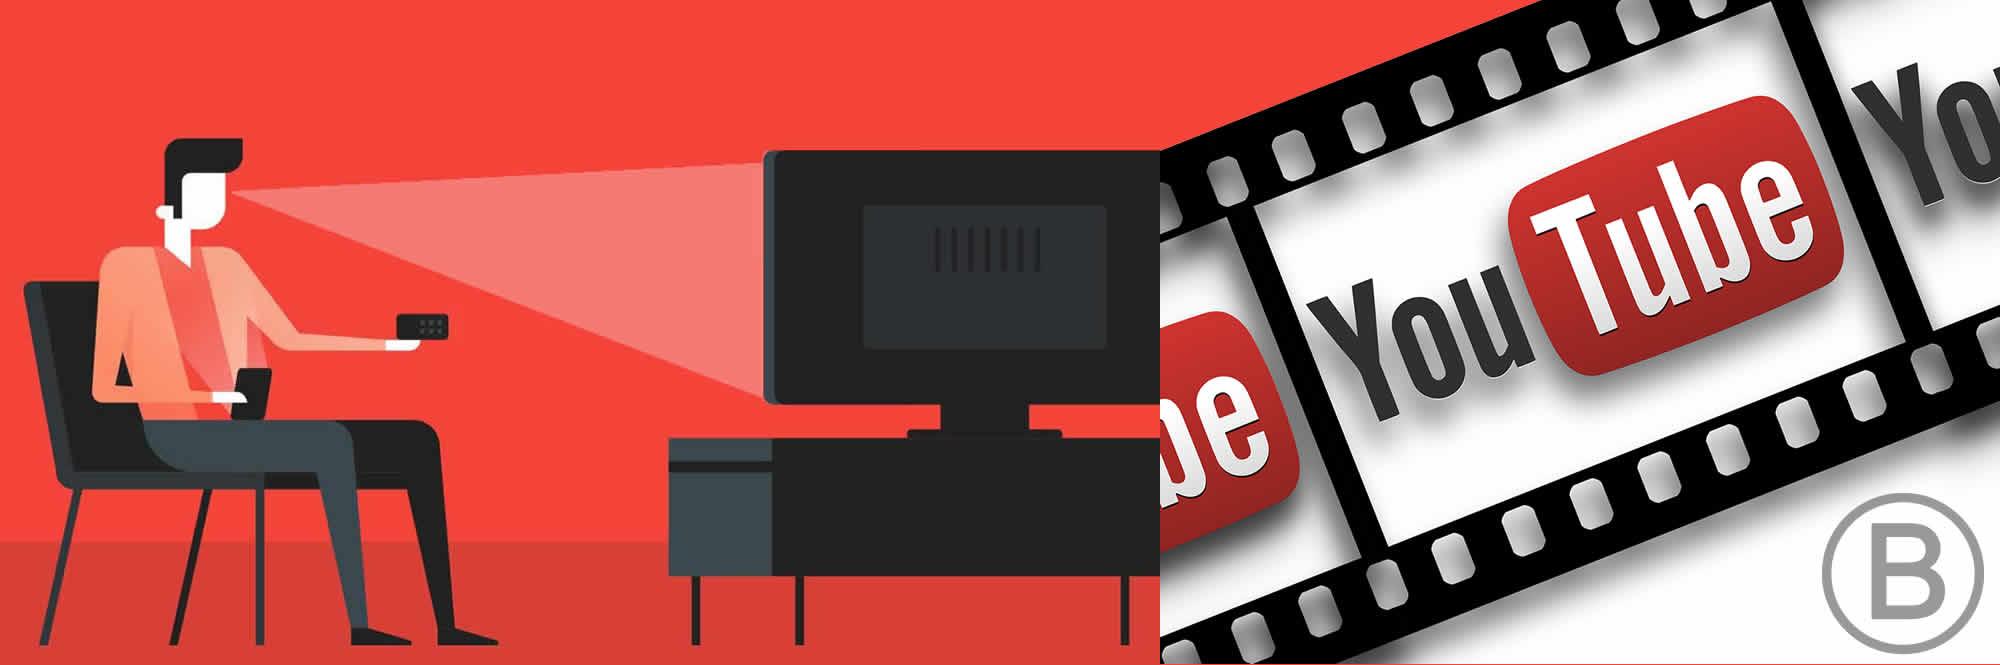 Generation X YouTube Habits - Brent Norris